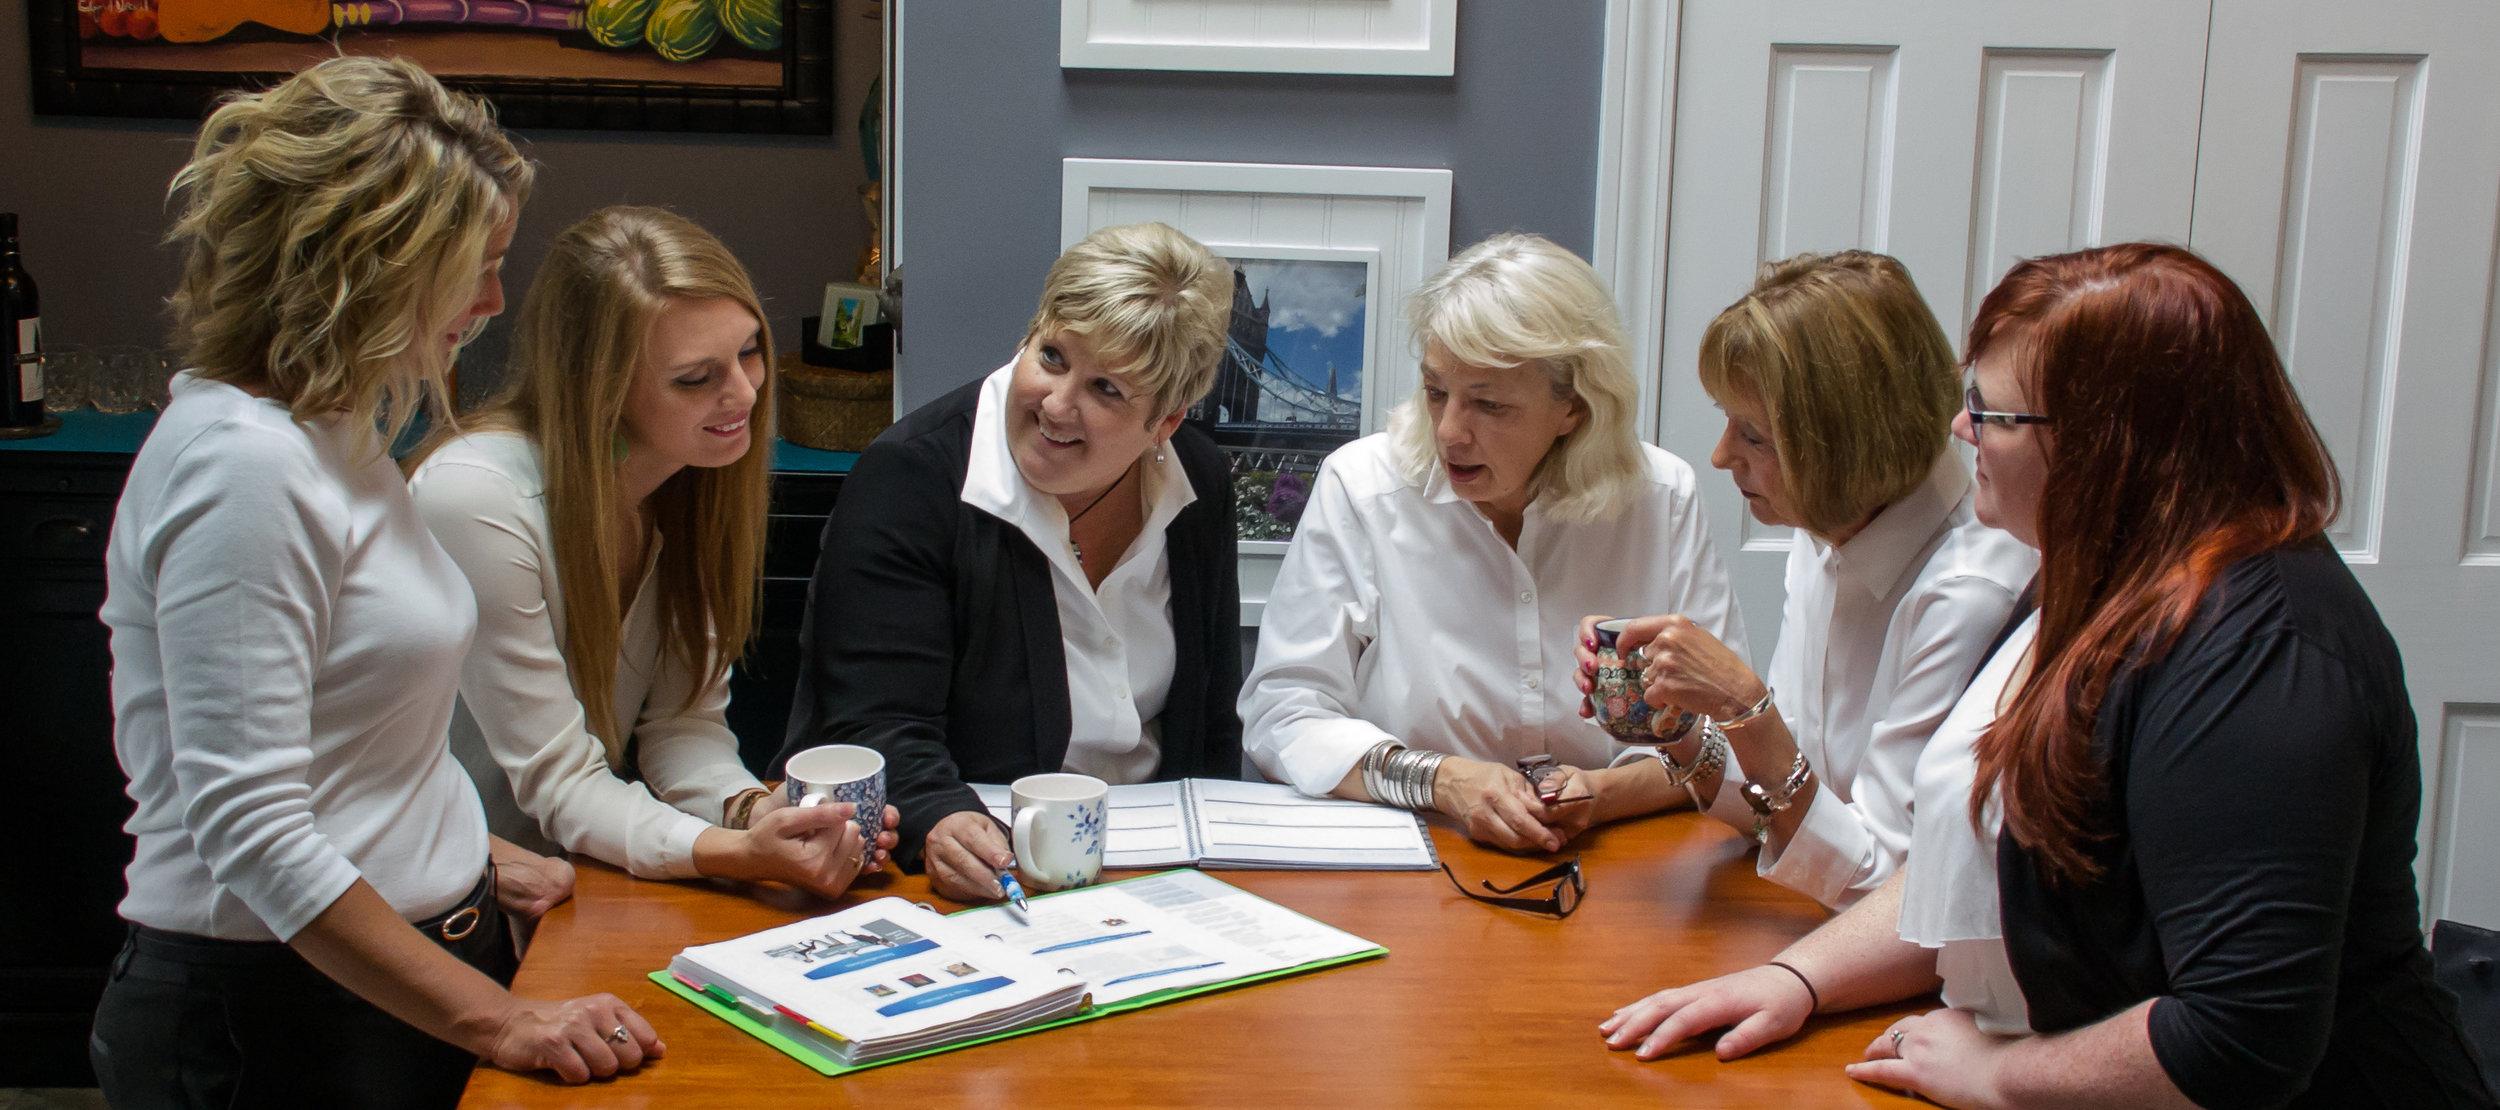 The Dau Consulting Team Leaning In (L-R): Andrea Applegate, Jade Smith, Jeanne Dau, Ann Beck, Jill Nilsen and Rachel Berg